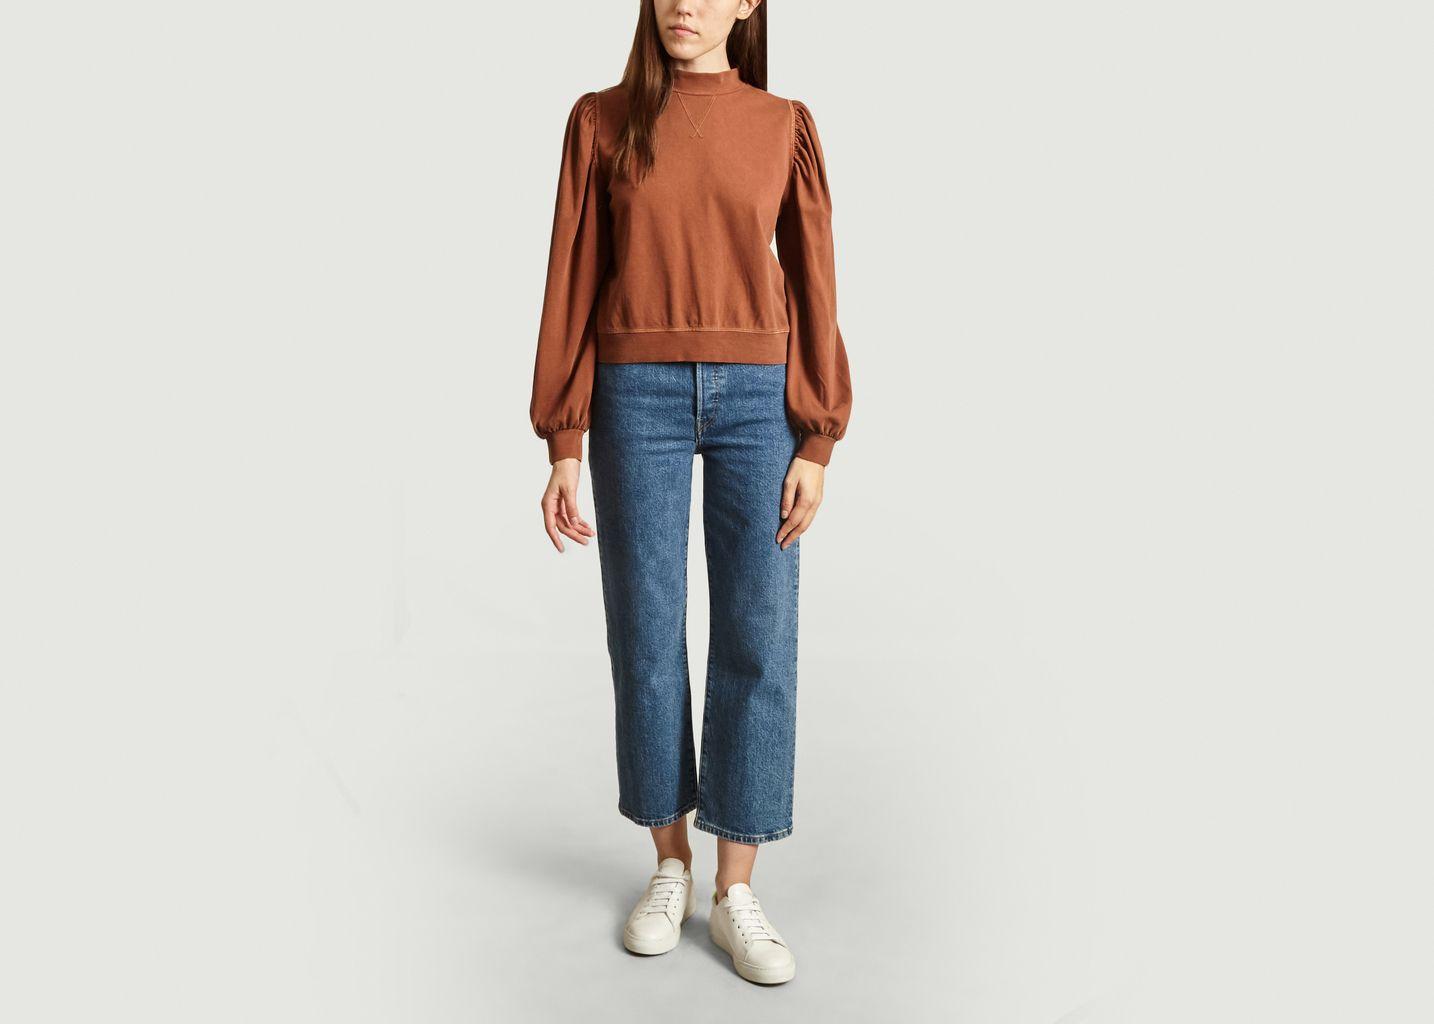 Sweatshirt manches bouffantes Luz - Soeur